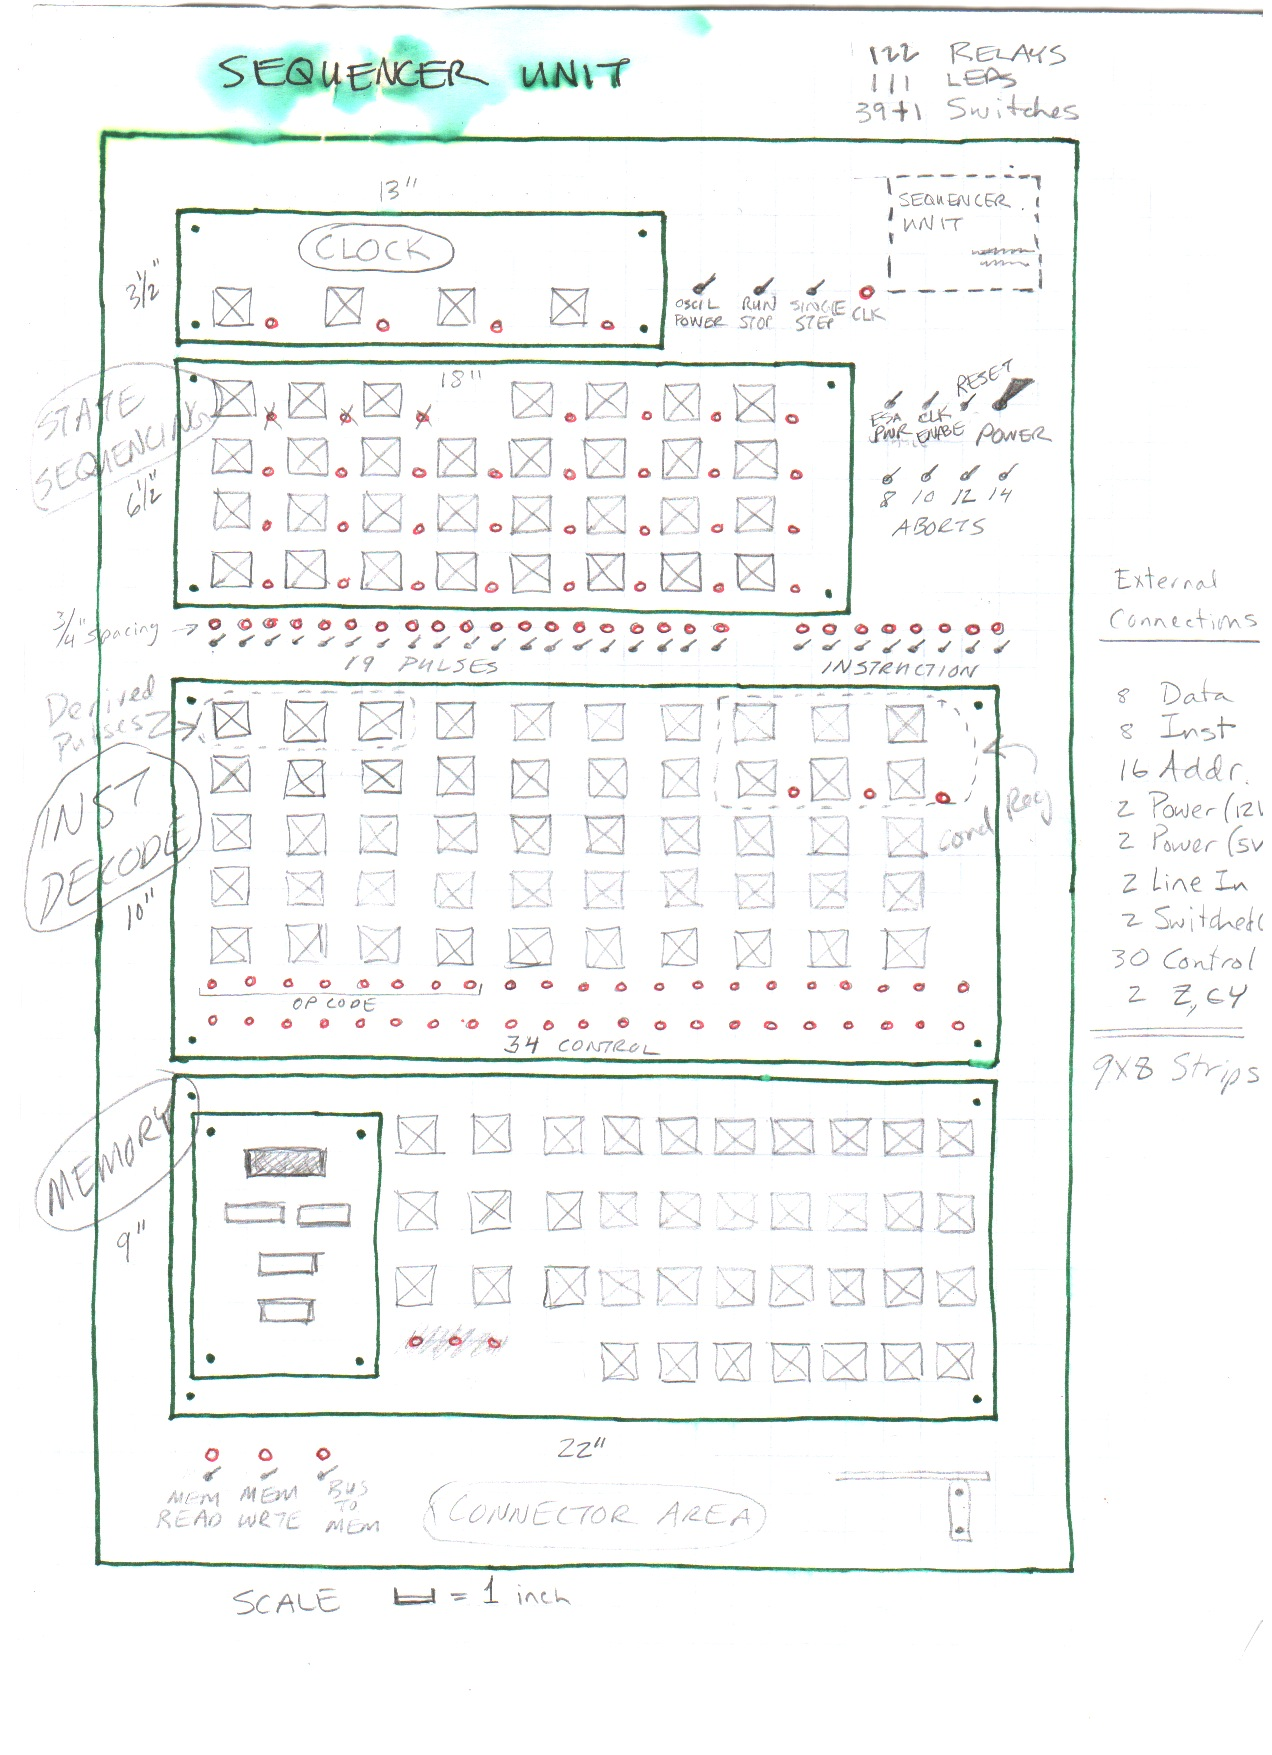 Circuit Diagrams 0 9 Counter Diagram Frontpanel Sequencerunit